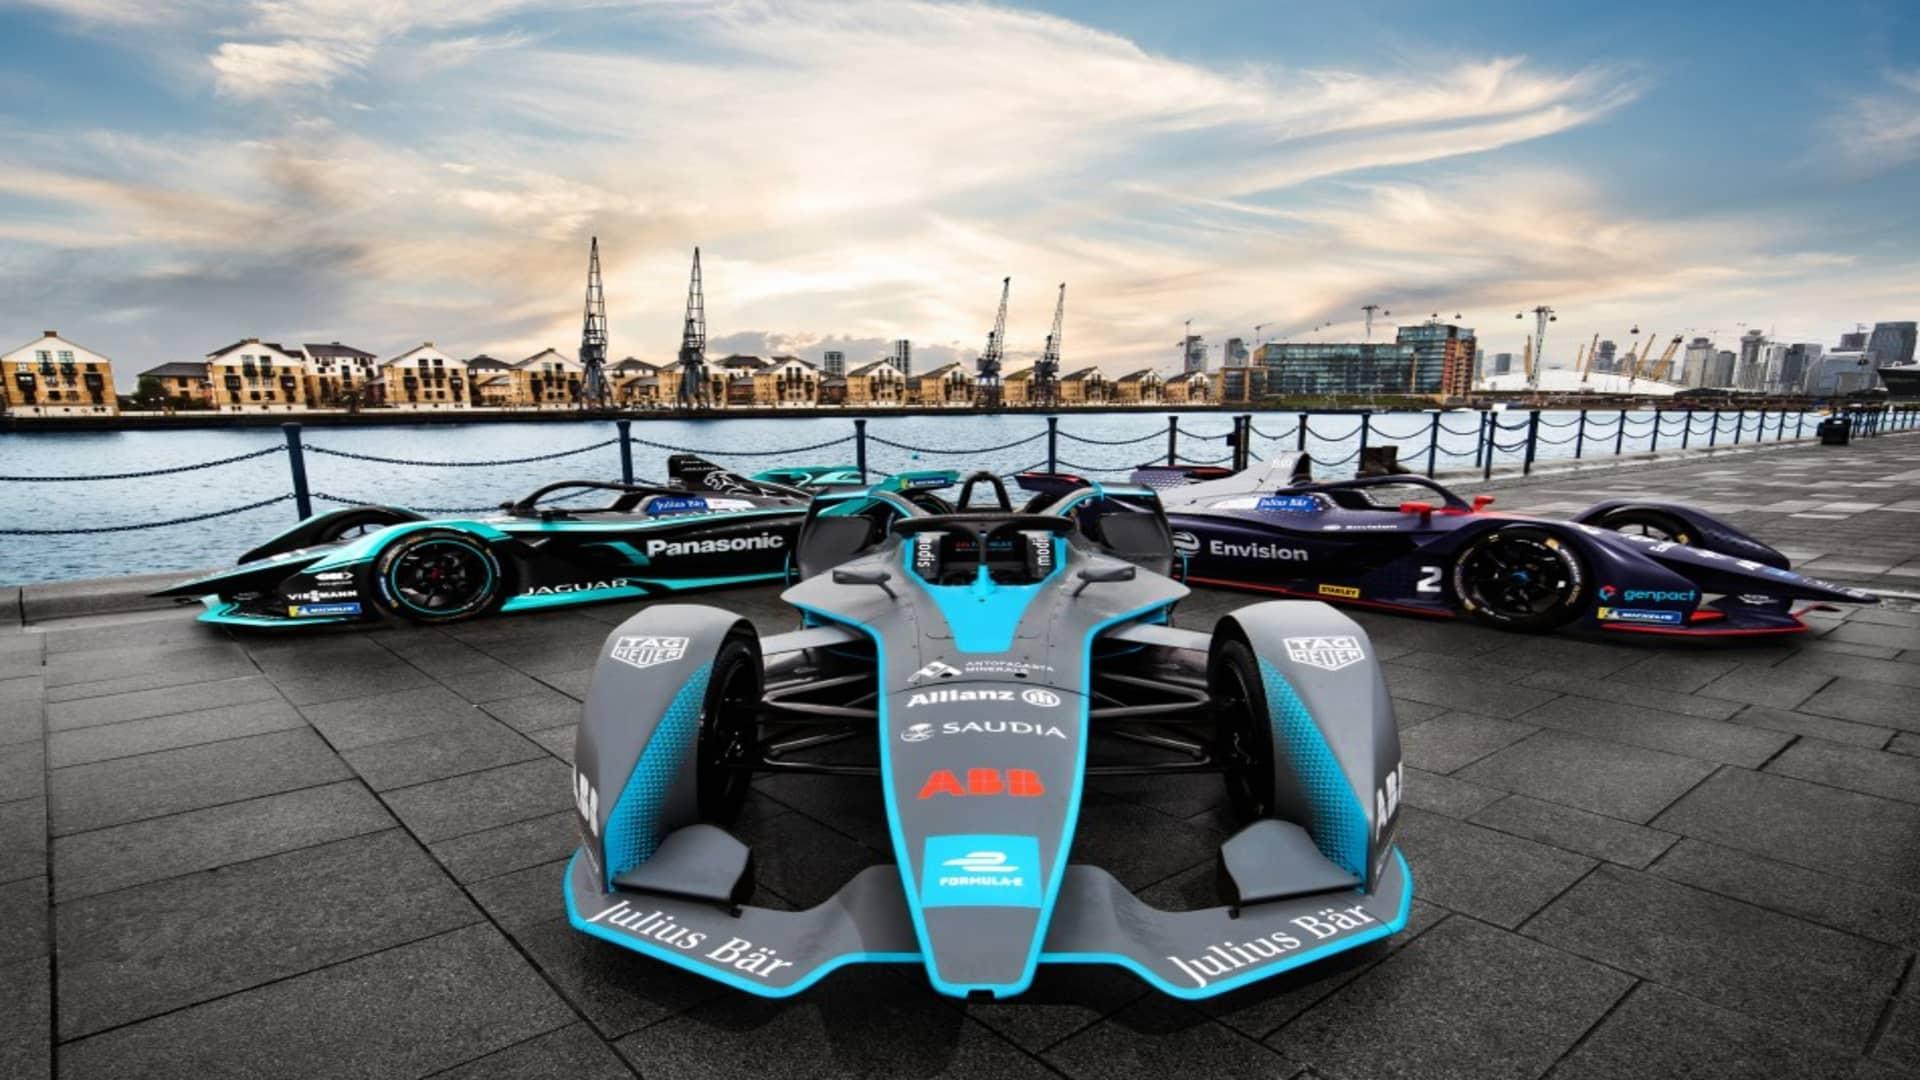 Fórmula E 2021: dónde ver, calendario, pilotos, escuderías, clasificación, reglas y ganadores